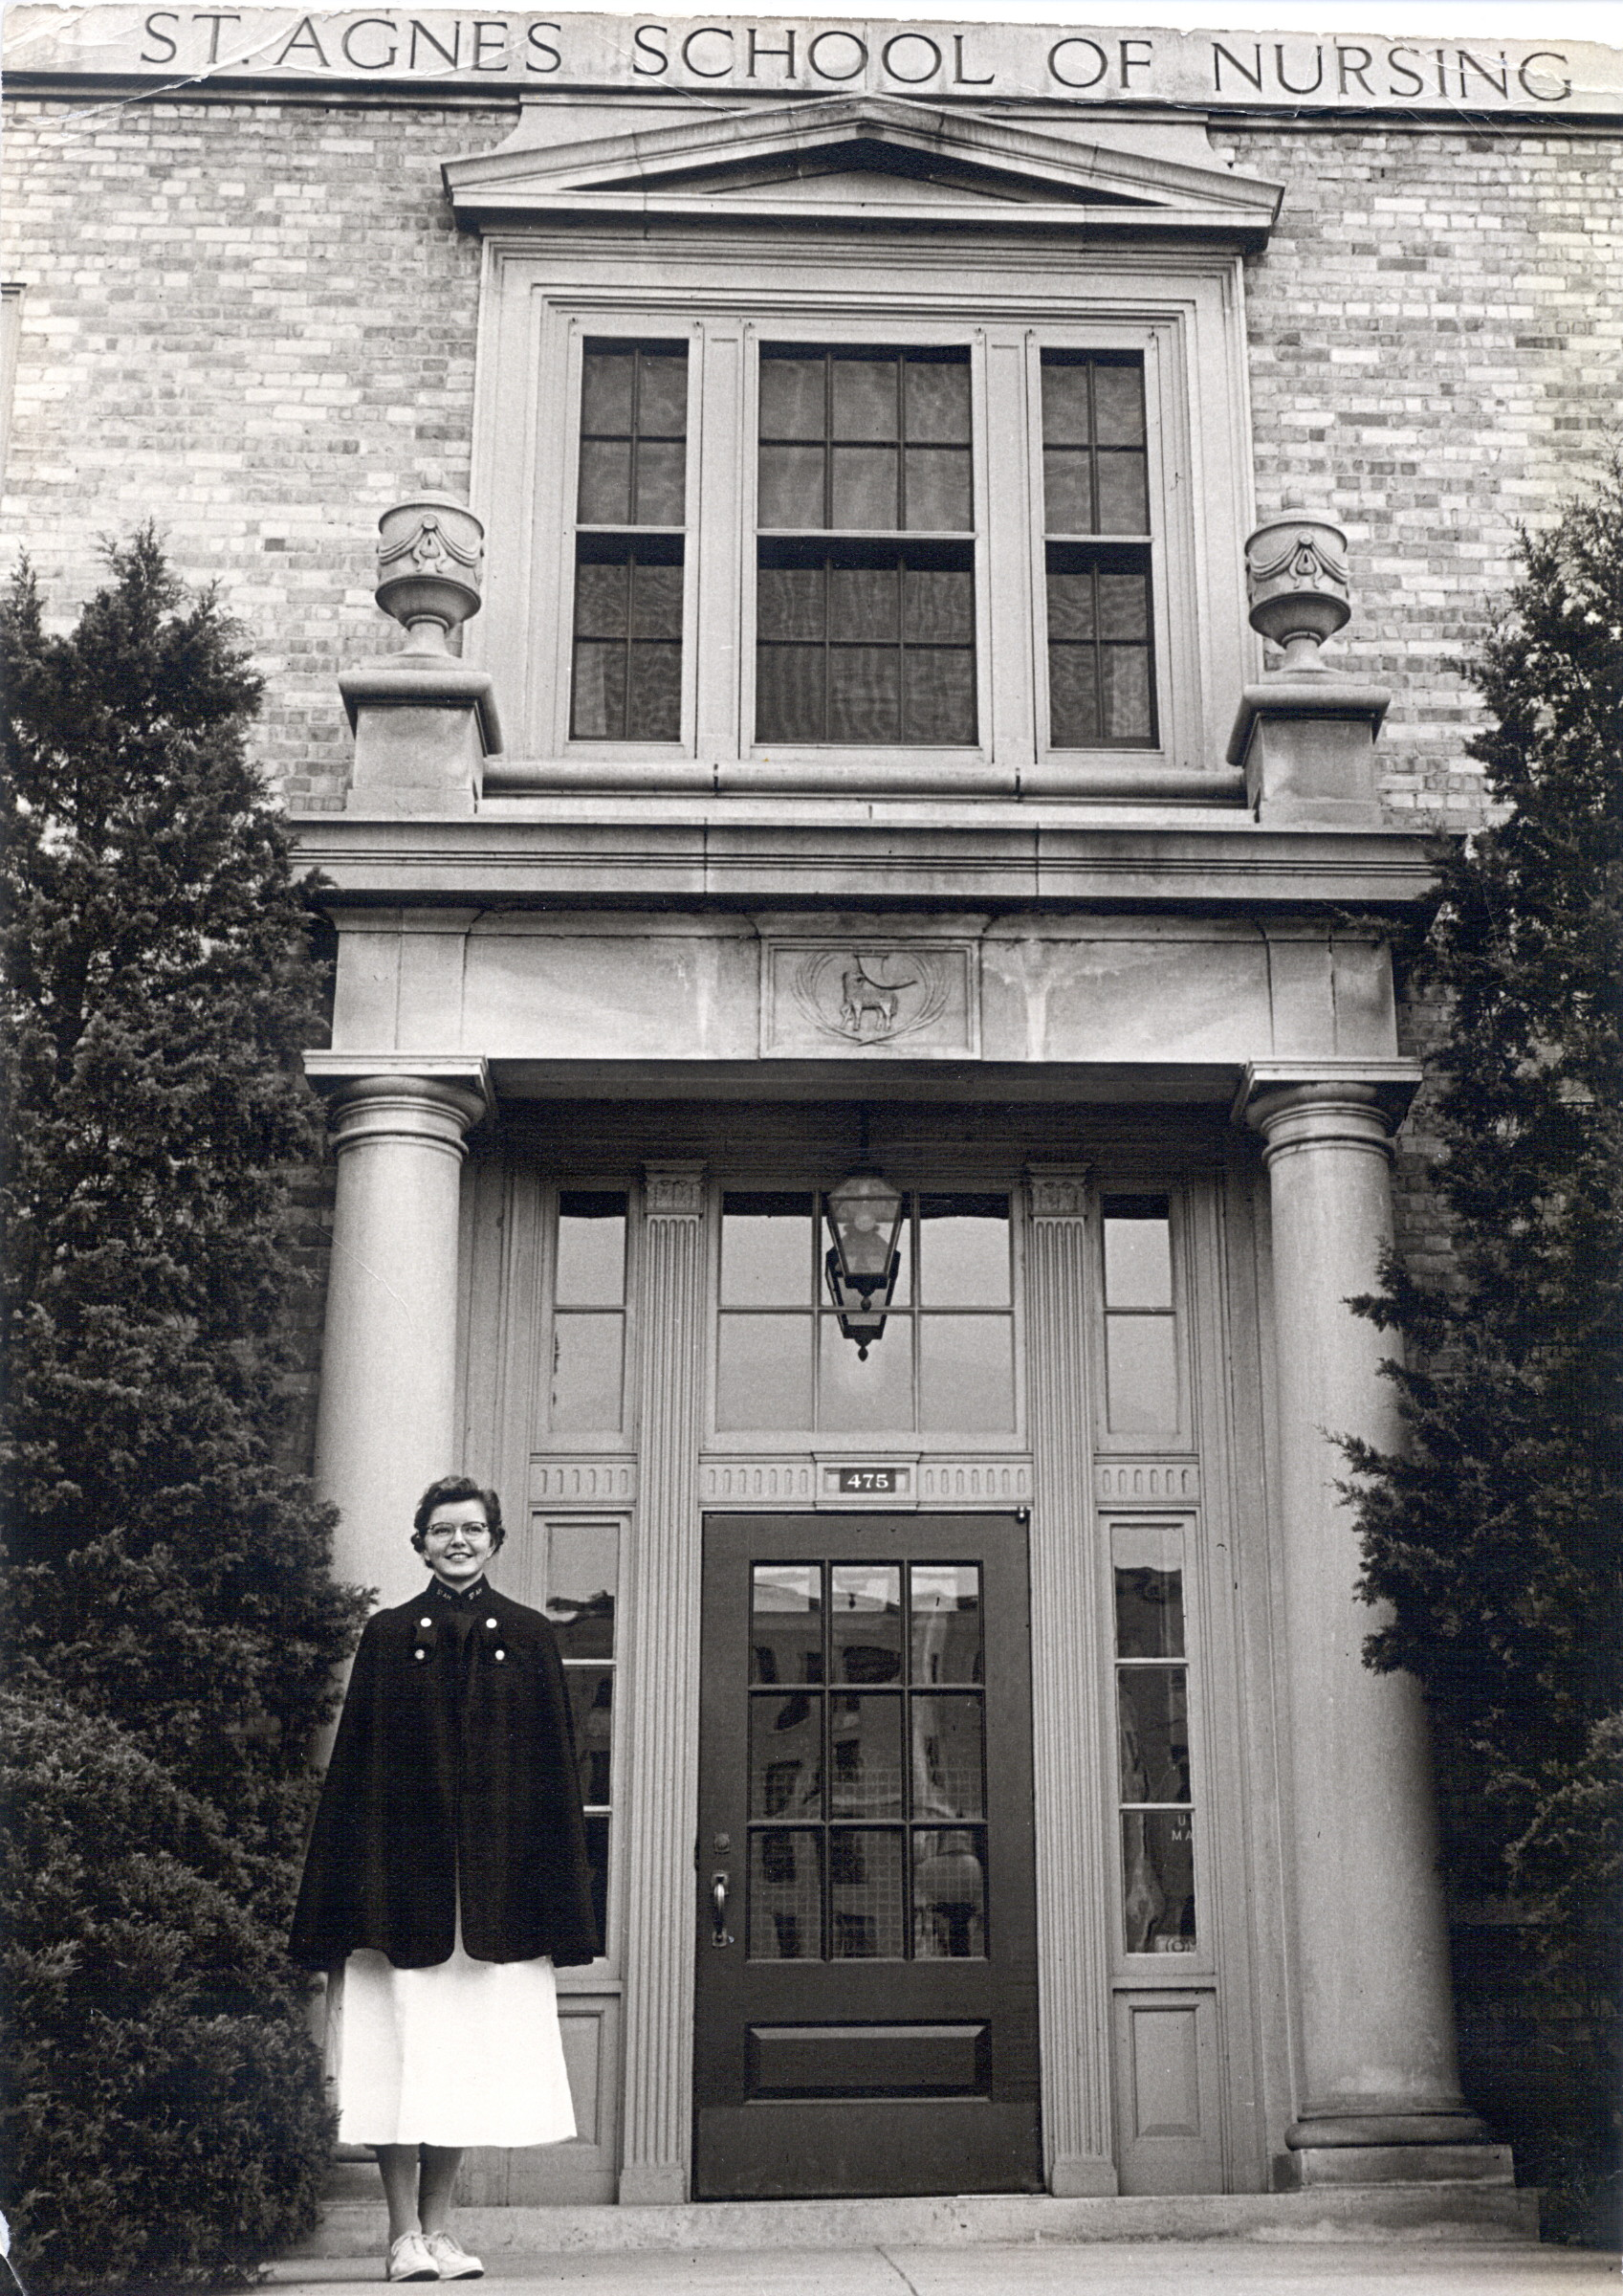 A nursing student stands outside St. Agnes School of Nursing, 1950s.